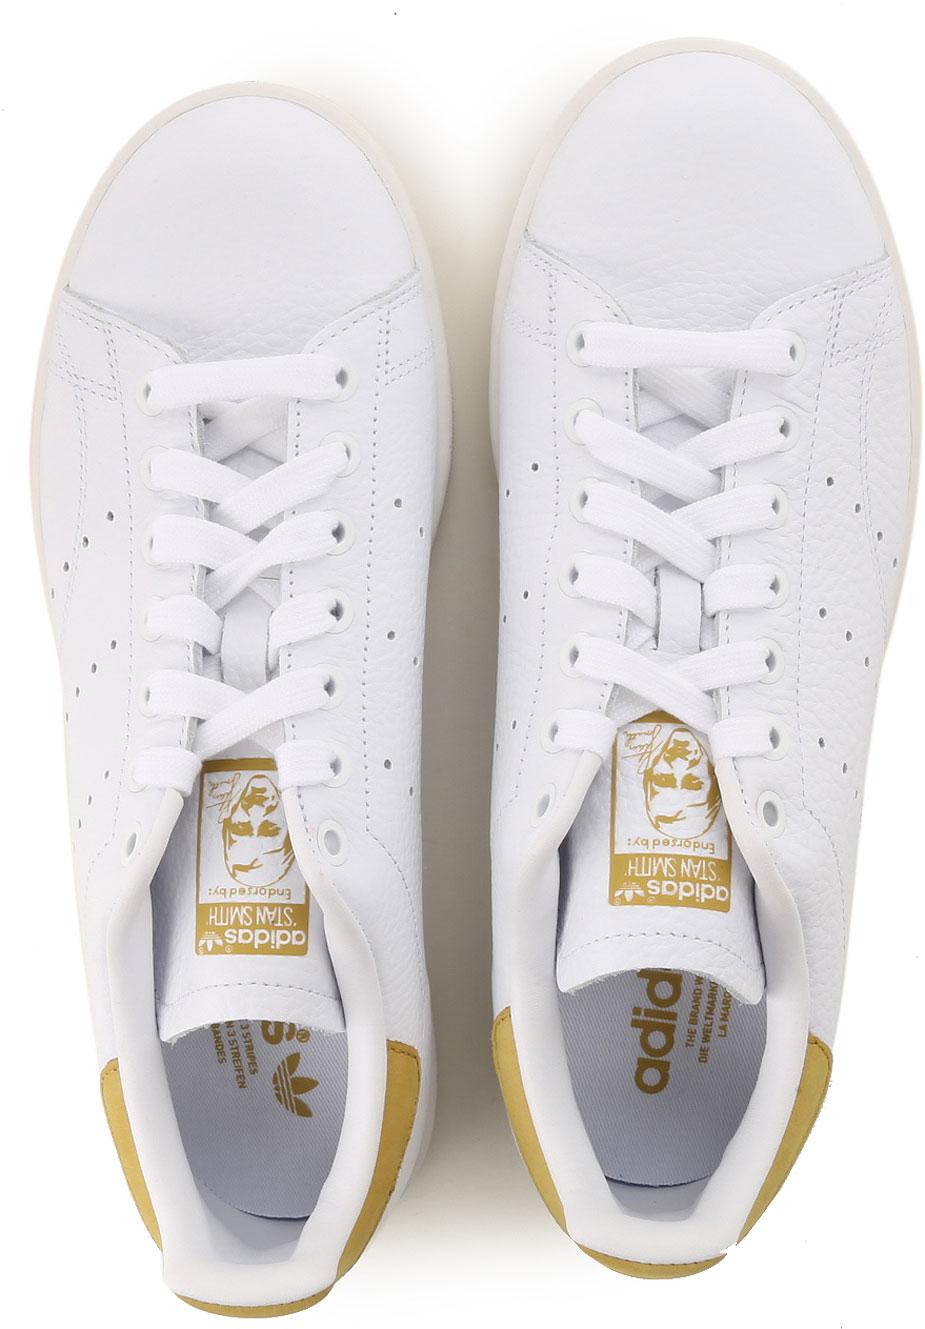 Stansmith Homme Produit Chaussures Code Bd7437 Biacru Rfvxw7r Adidas ZPXOuTki